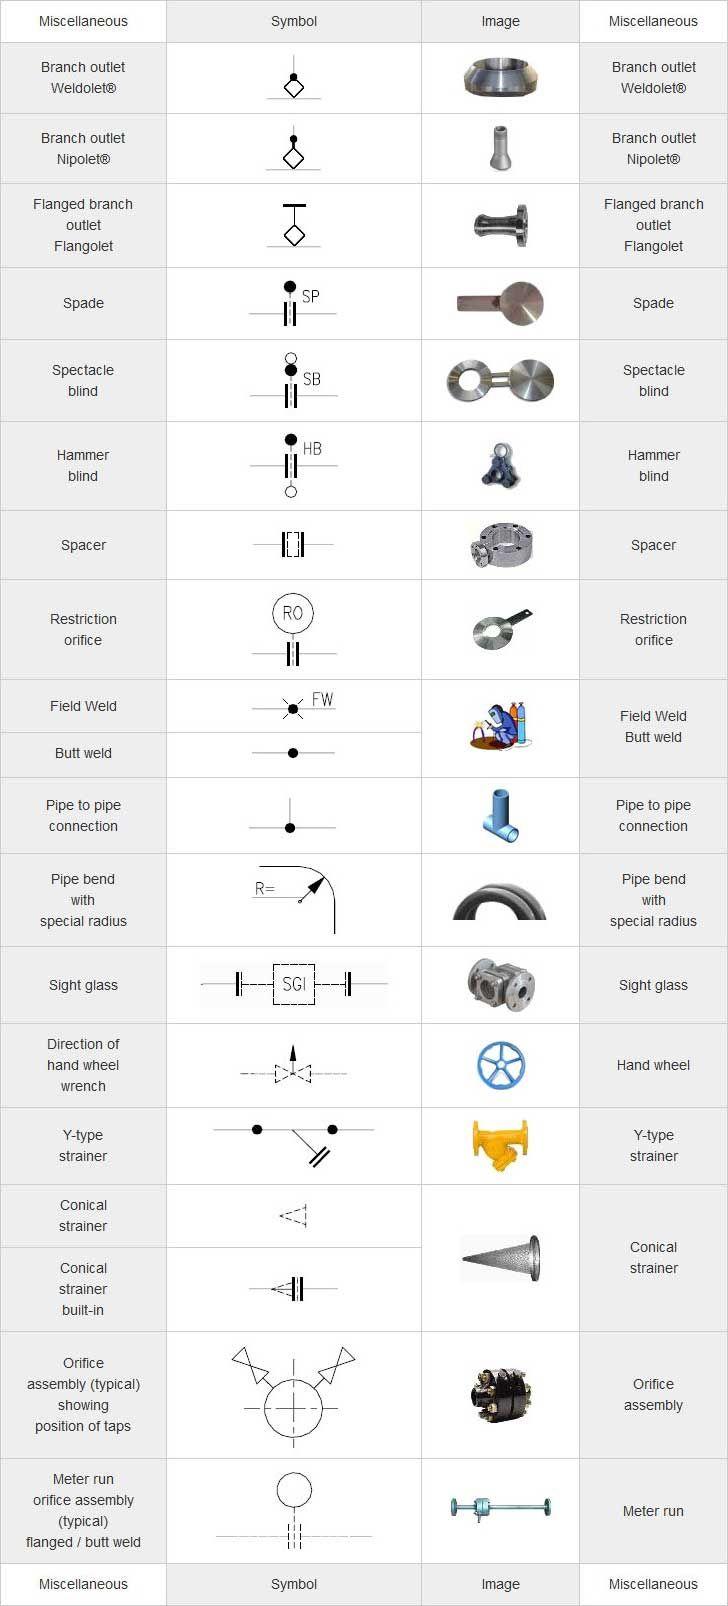 S Plan Wiring Diagram System Boiler Gmc Yukon Radio Mechanical Symbols For Isometric Drawings | Pneumatic In 2019 Engineering, Piping ...